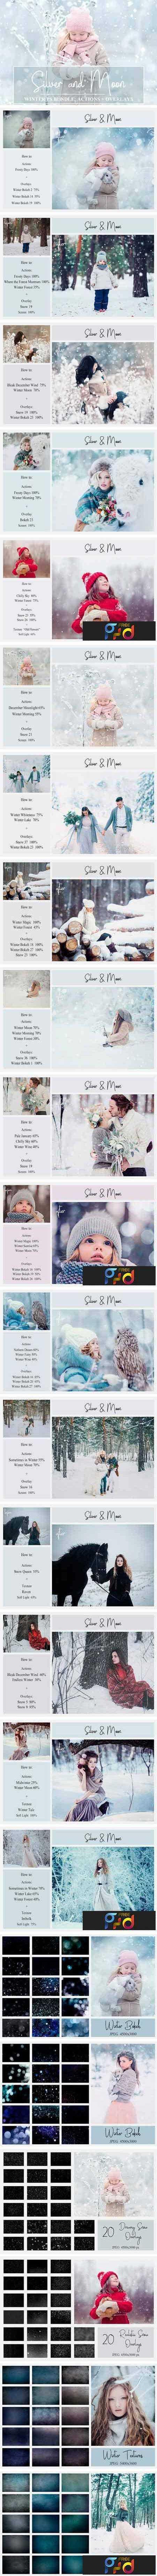 1708215 Winter Bundle PS Actions + Overlays 2052253 - FreePSDvn